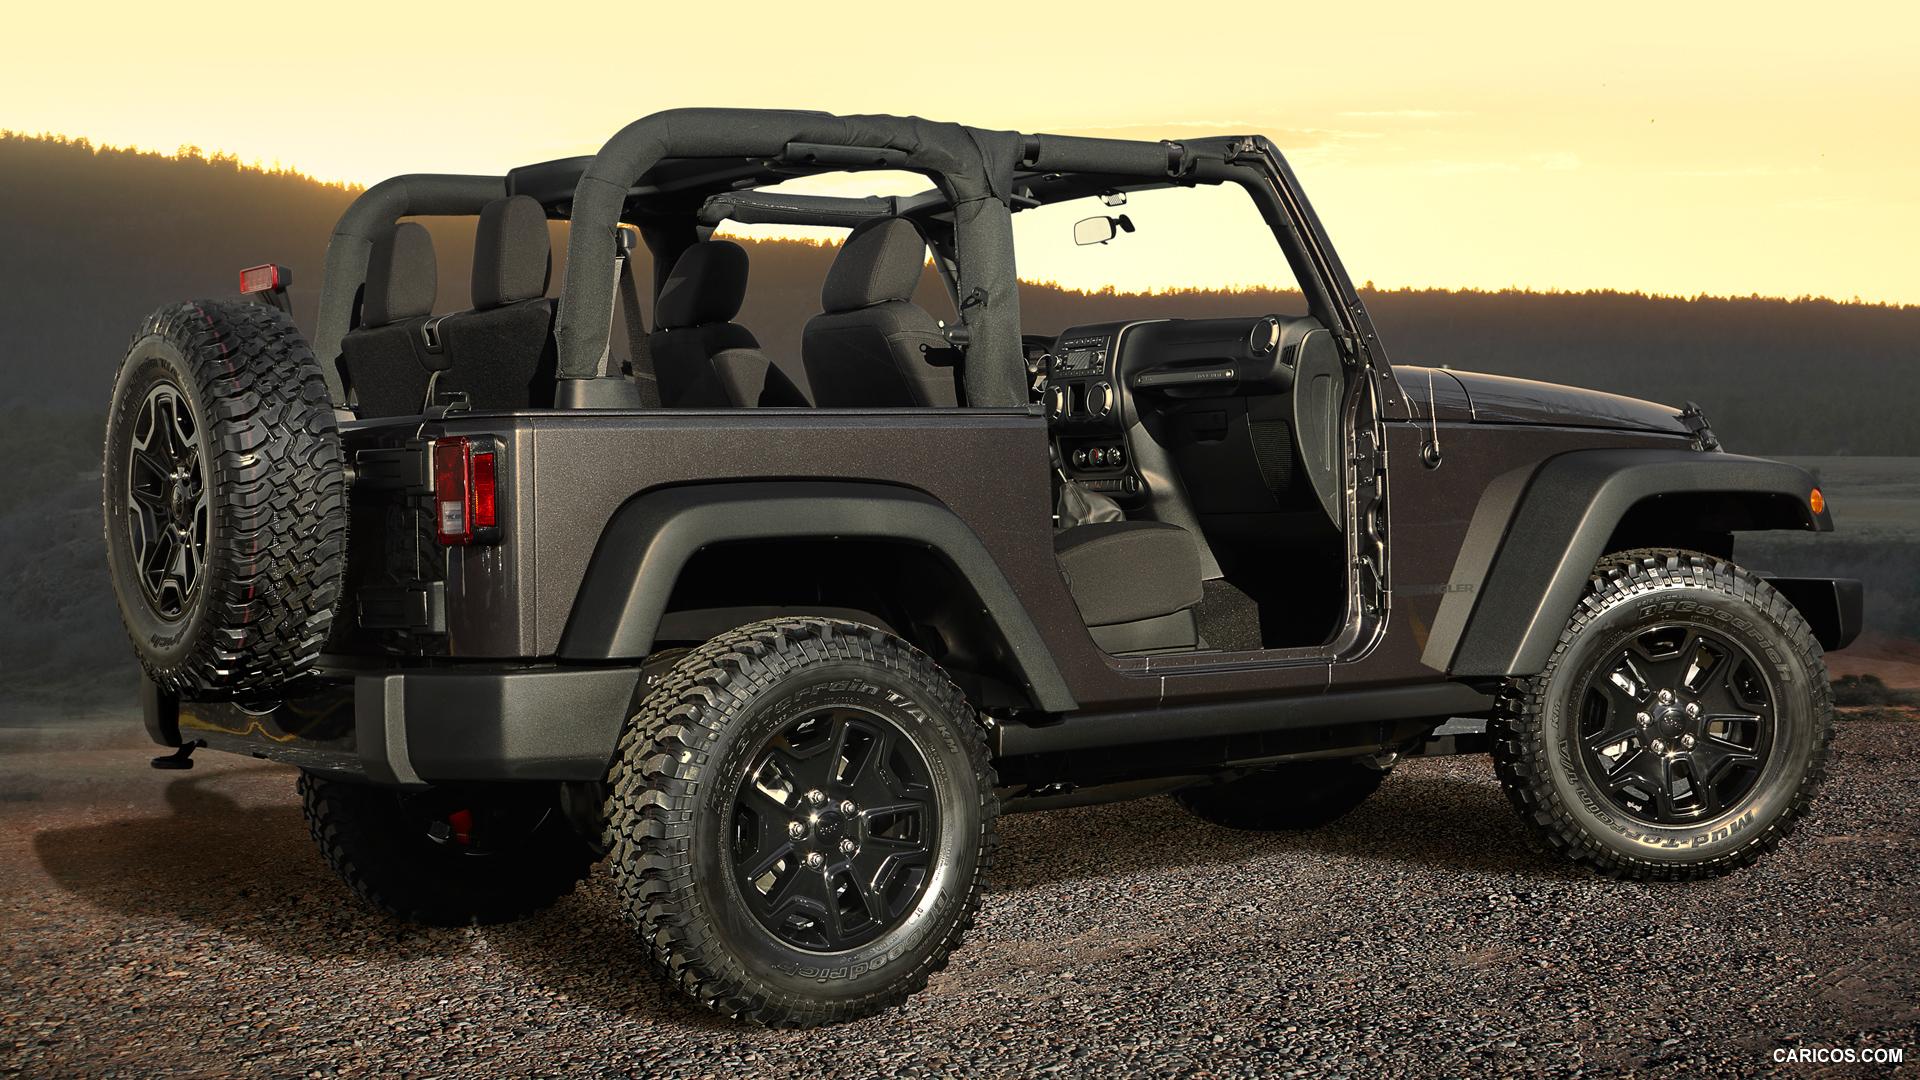 2014 Jeep Wrangler #10 Jeep Wrangler #10